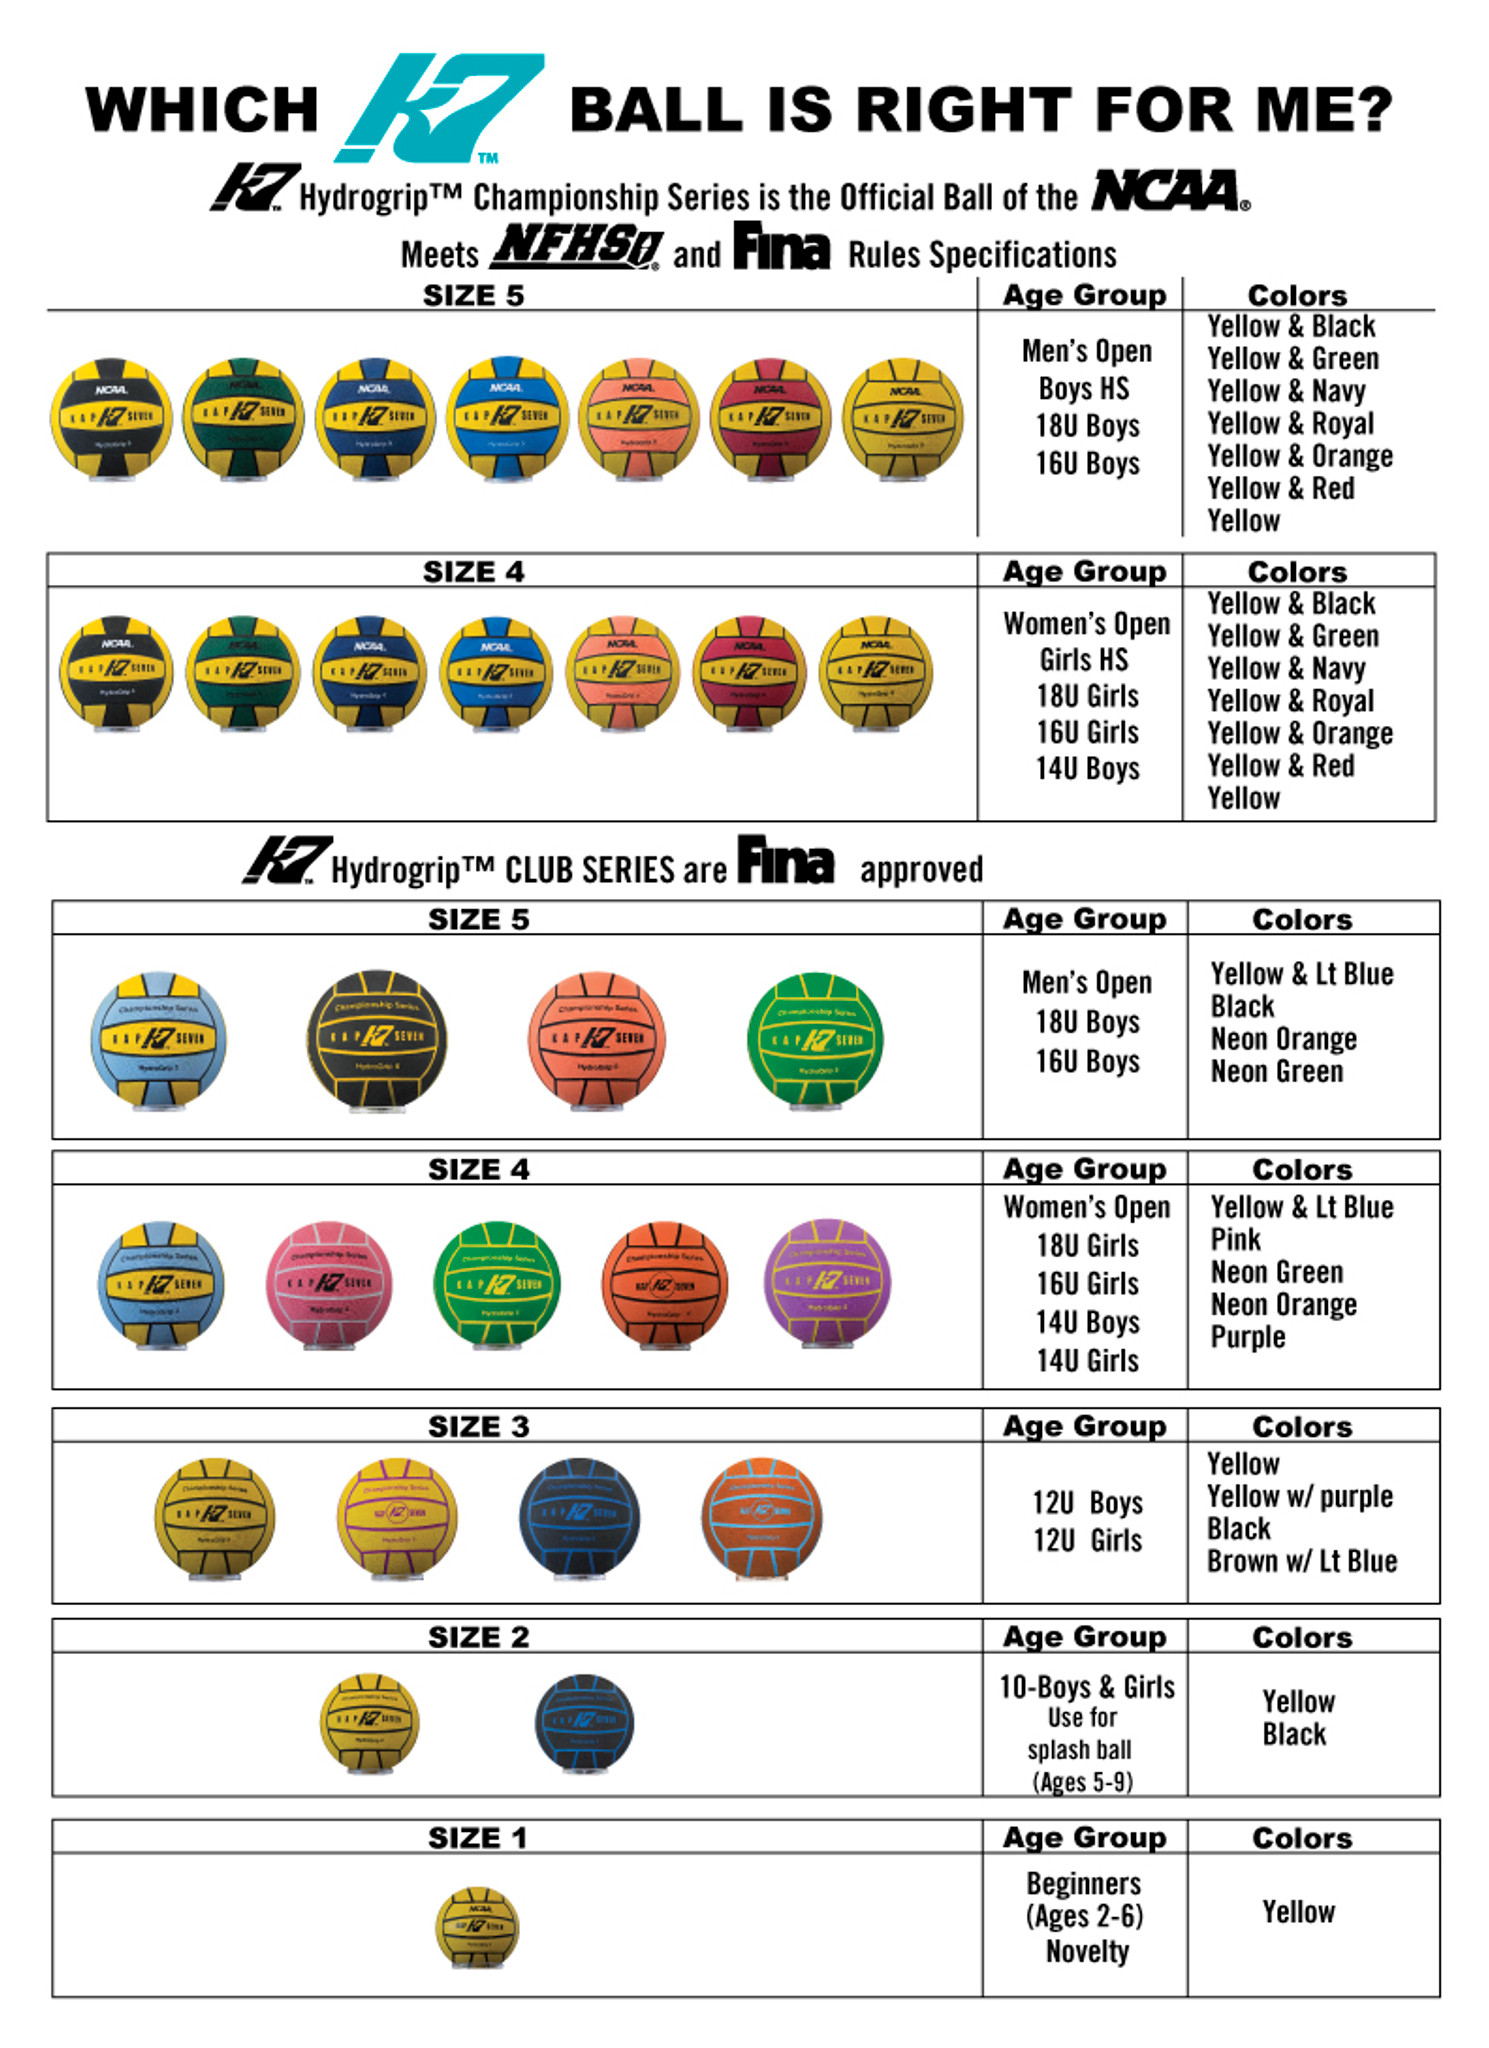 KAP7 Splashball: The Official Competition Ball of USA Water Polo